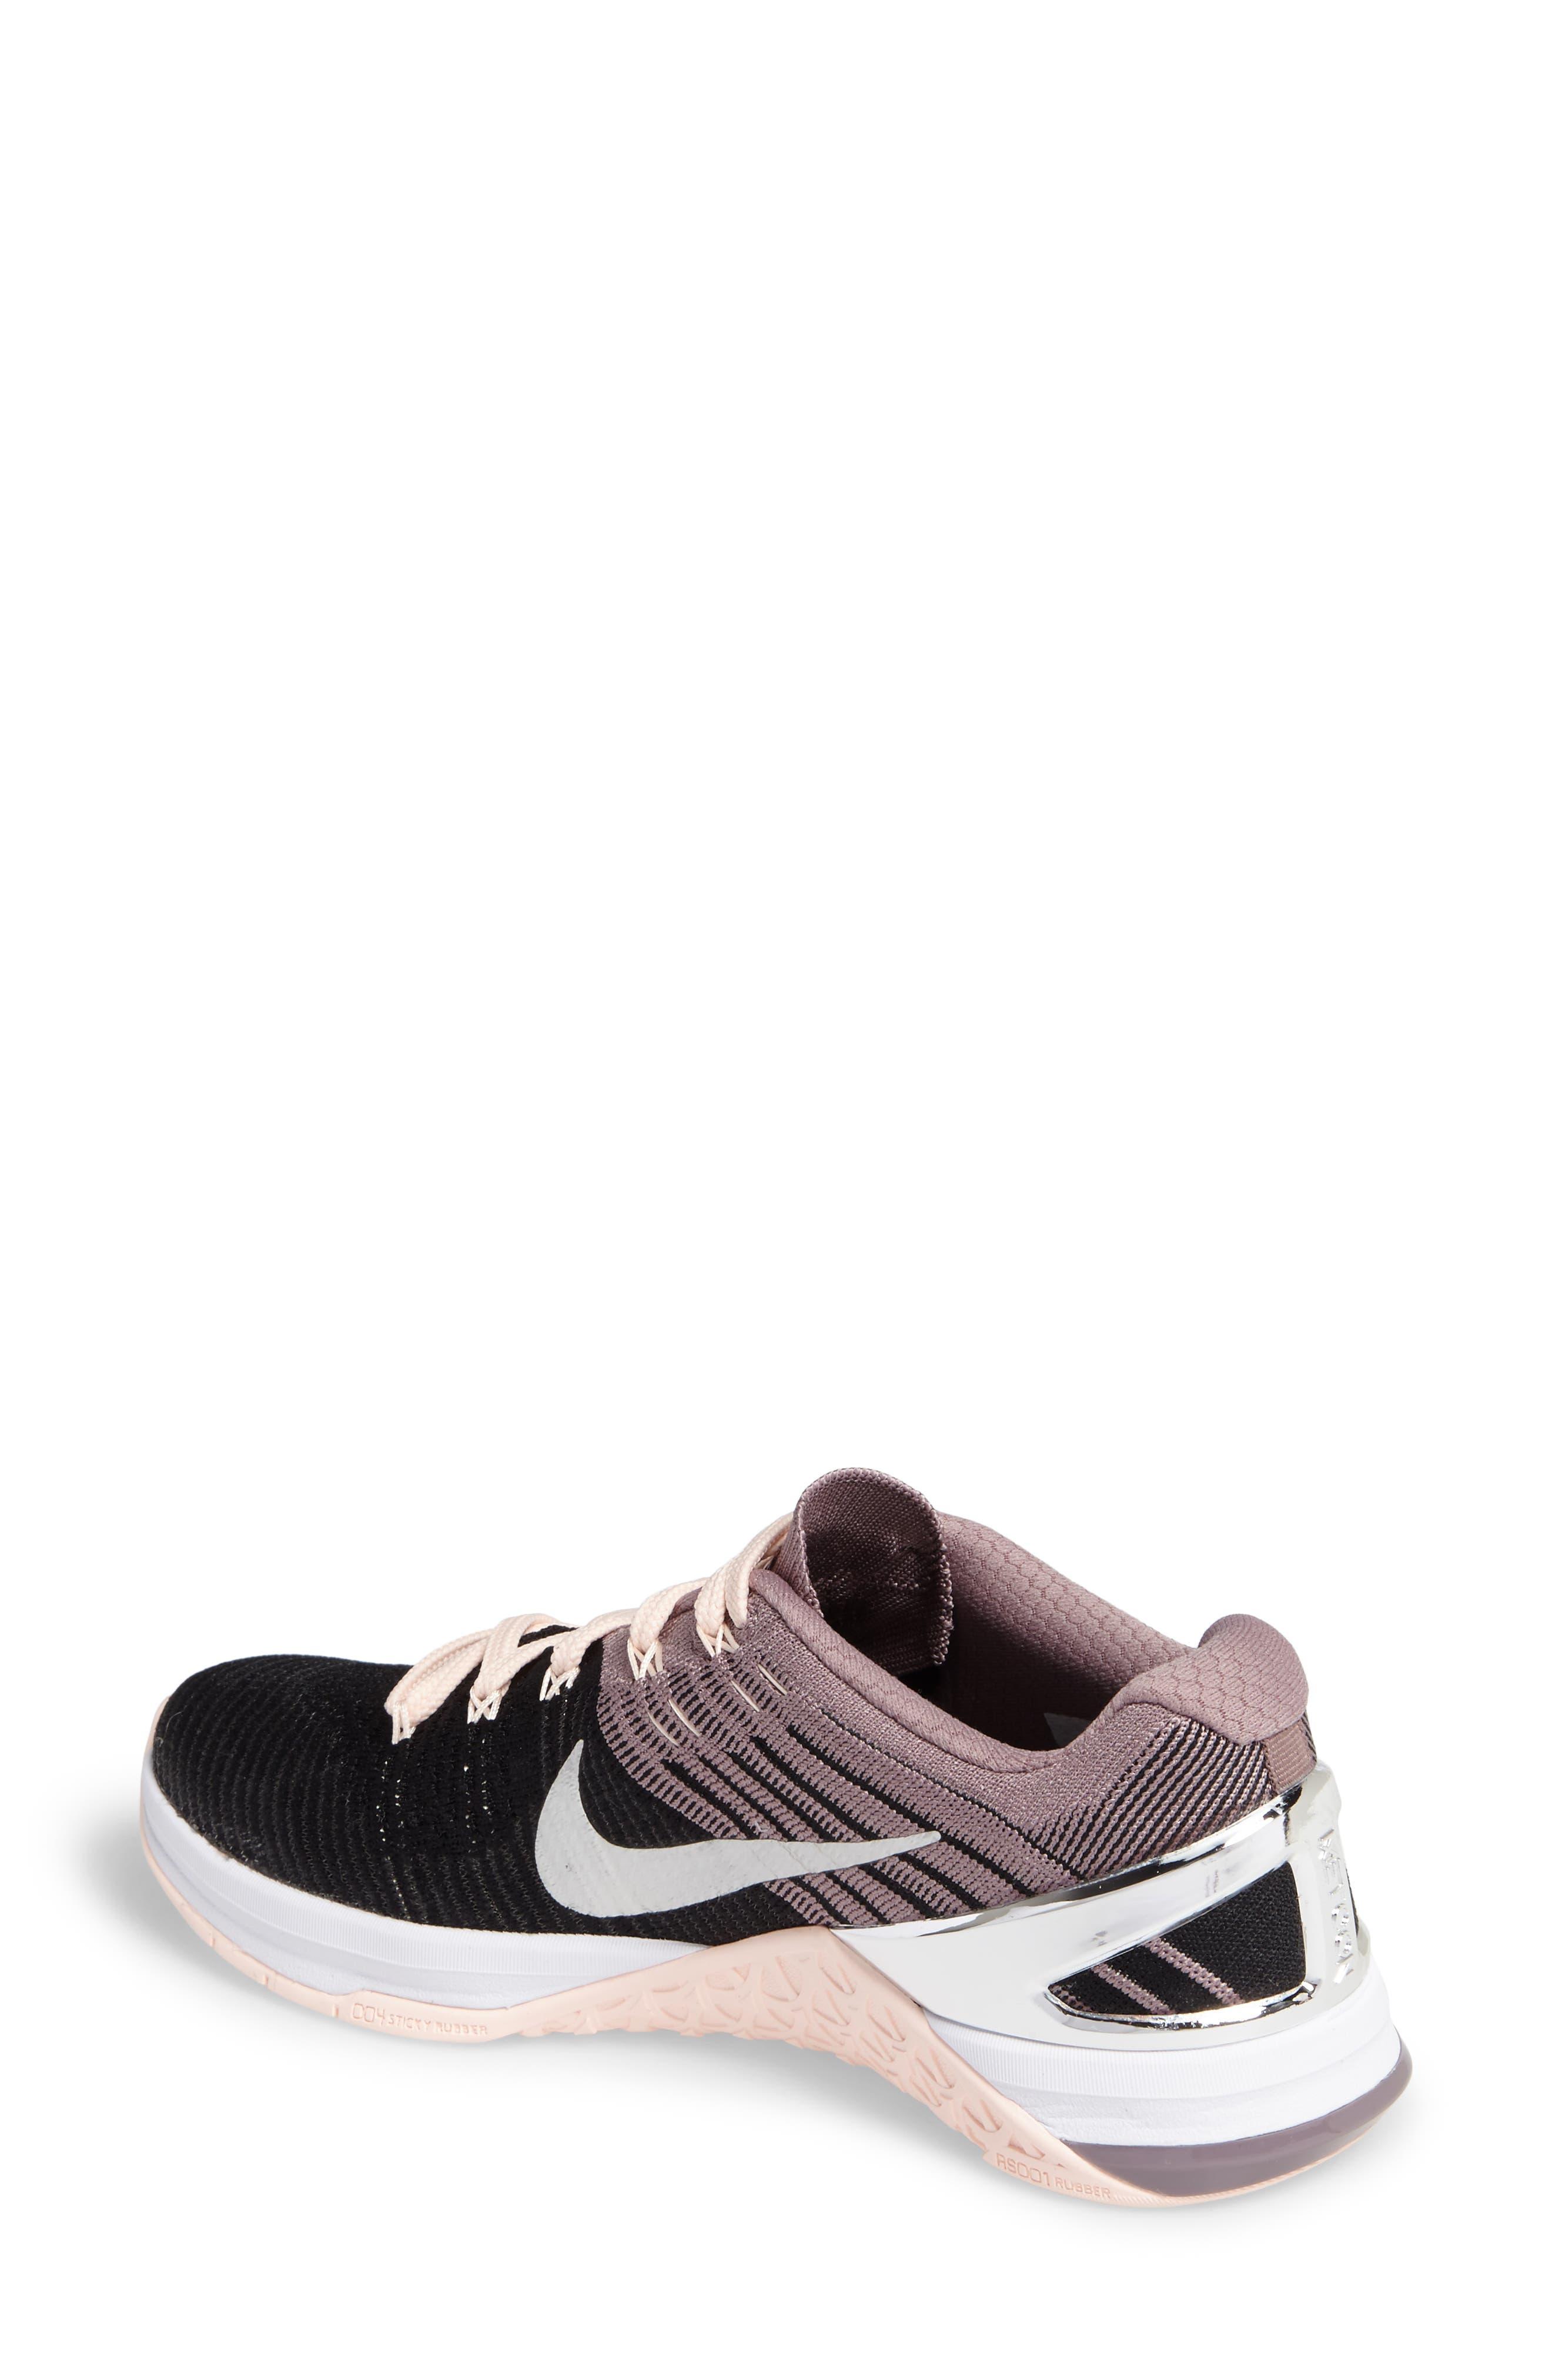 Alternate Image 2  - Nike Metcon DSX Flyknit Chrome Blush Training Shoe (Women)